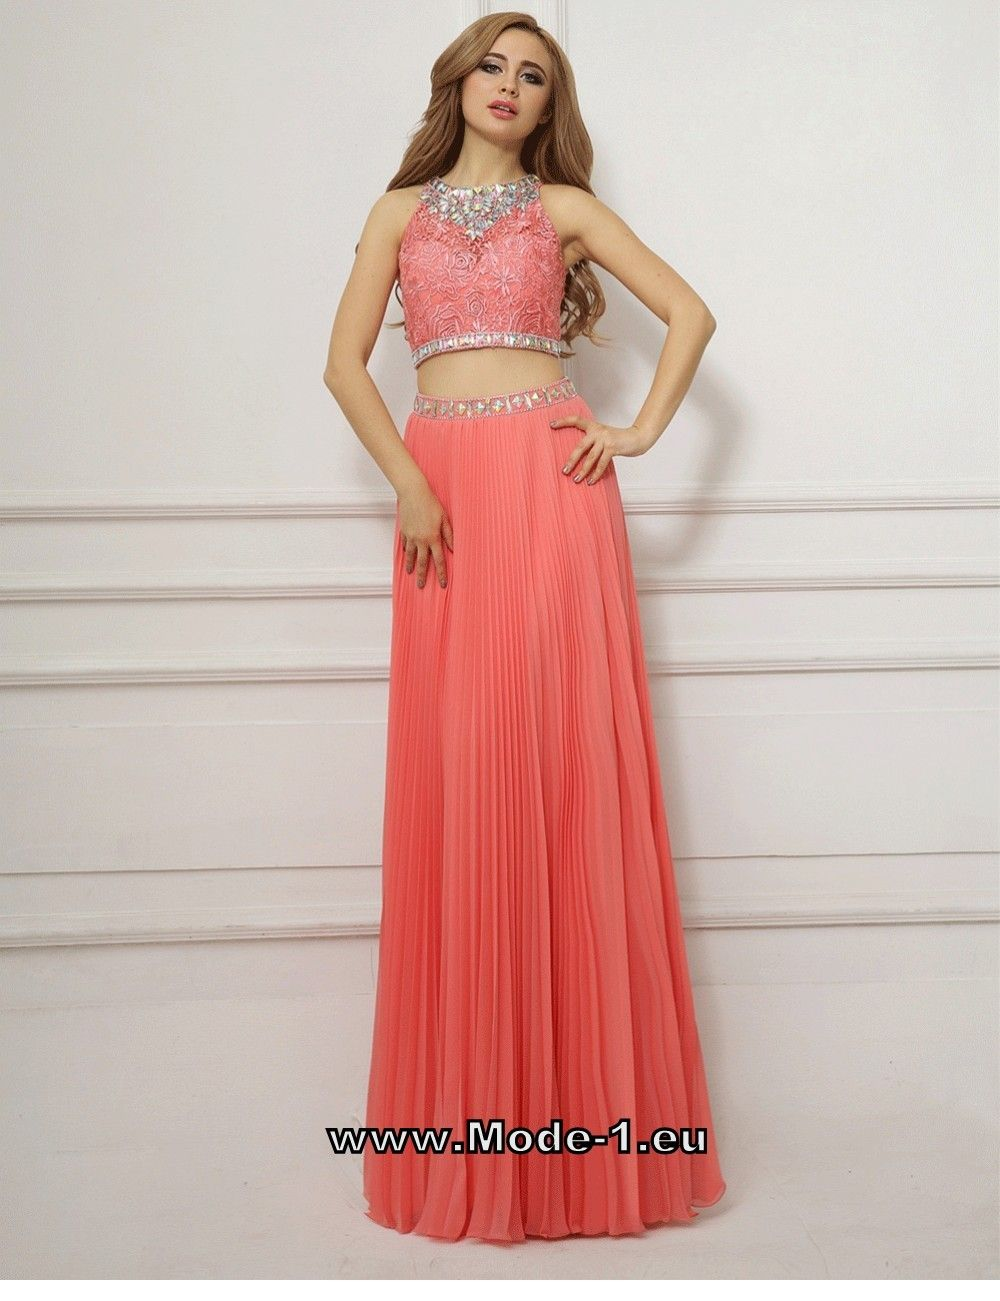 16 teiliges Abendkleid Amiah Lachs - Online & Trend Farben ✓ Must